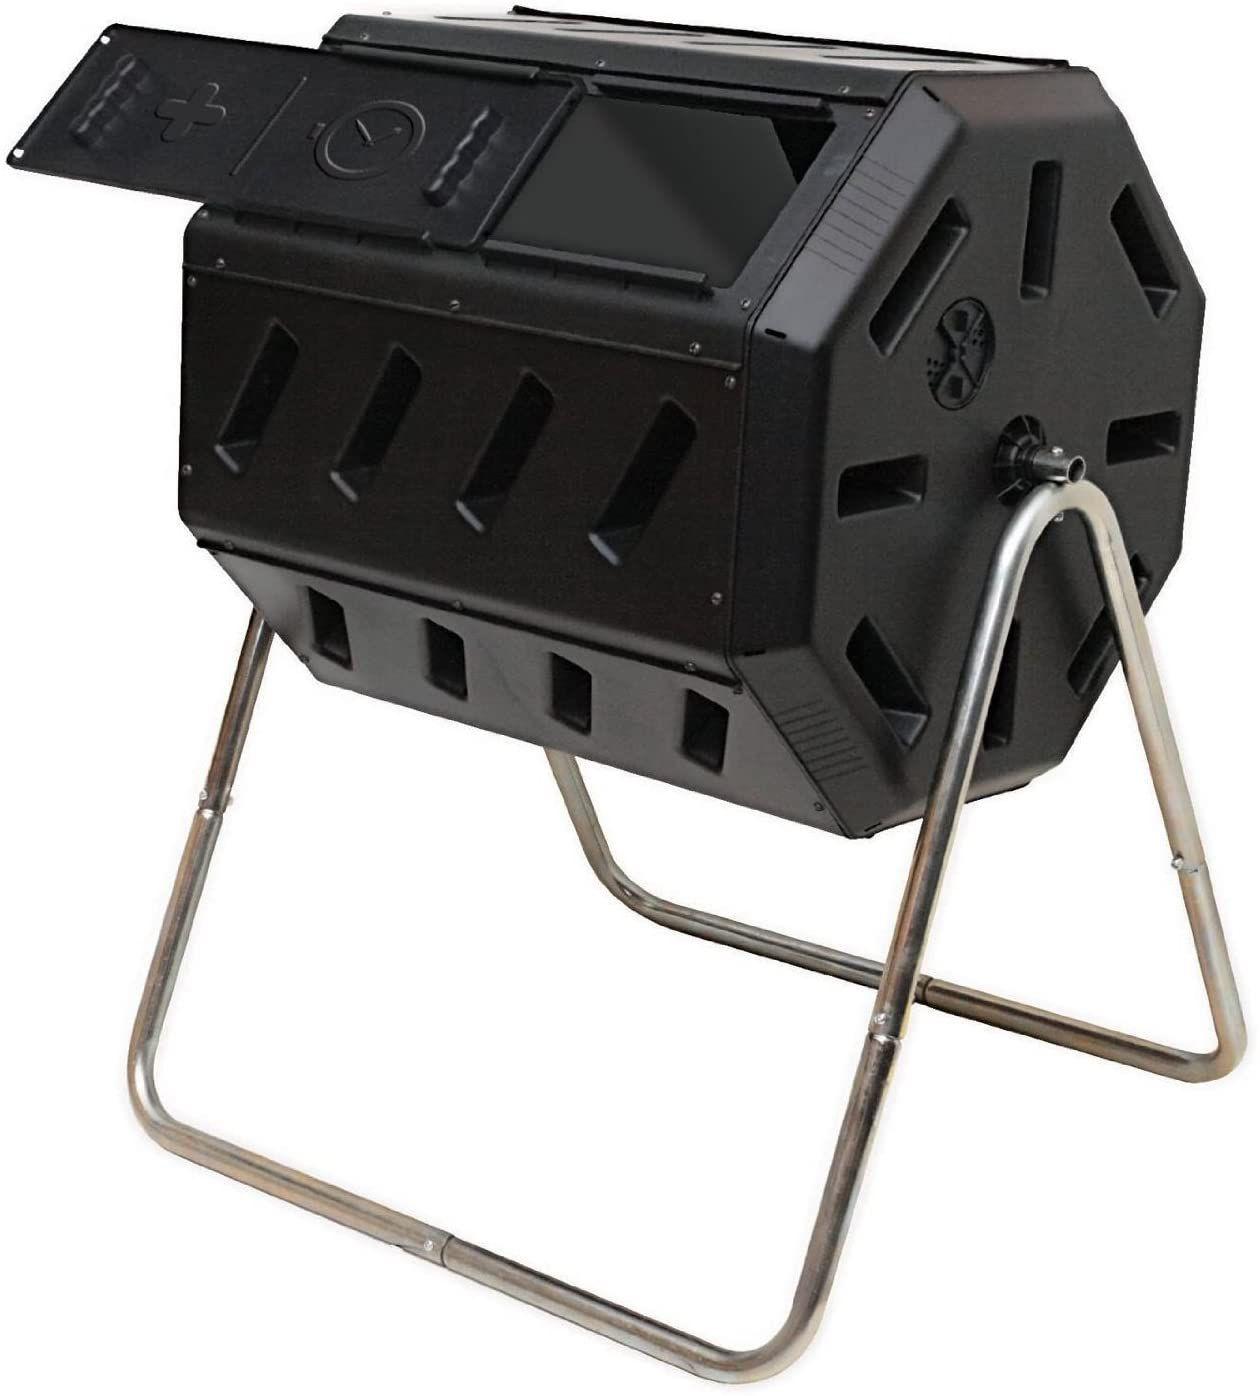 Dual Chamber Tumbling Composter